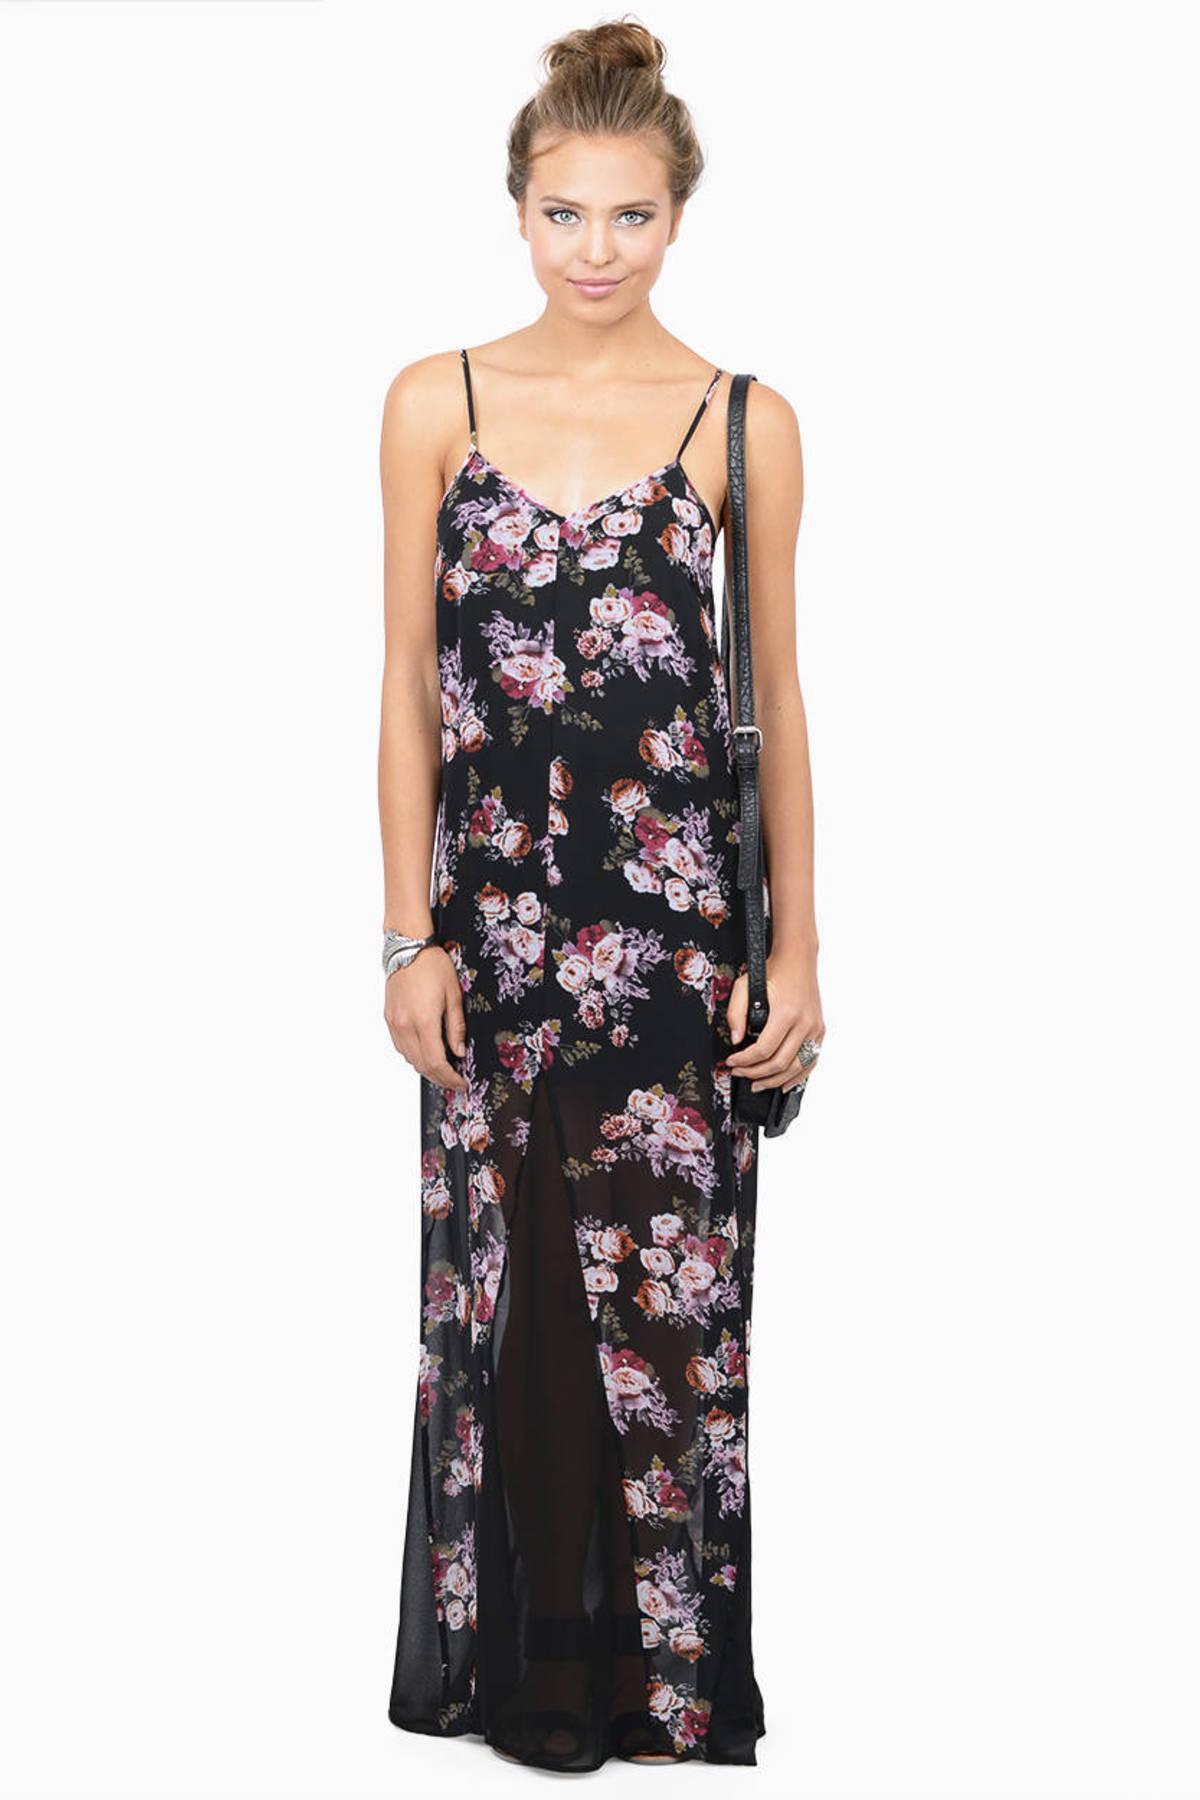 Sale Maxi Dresses Under $50 - Shop Sale Maxi Dresses Under $50 at Tobi